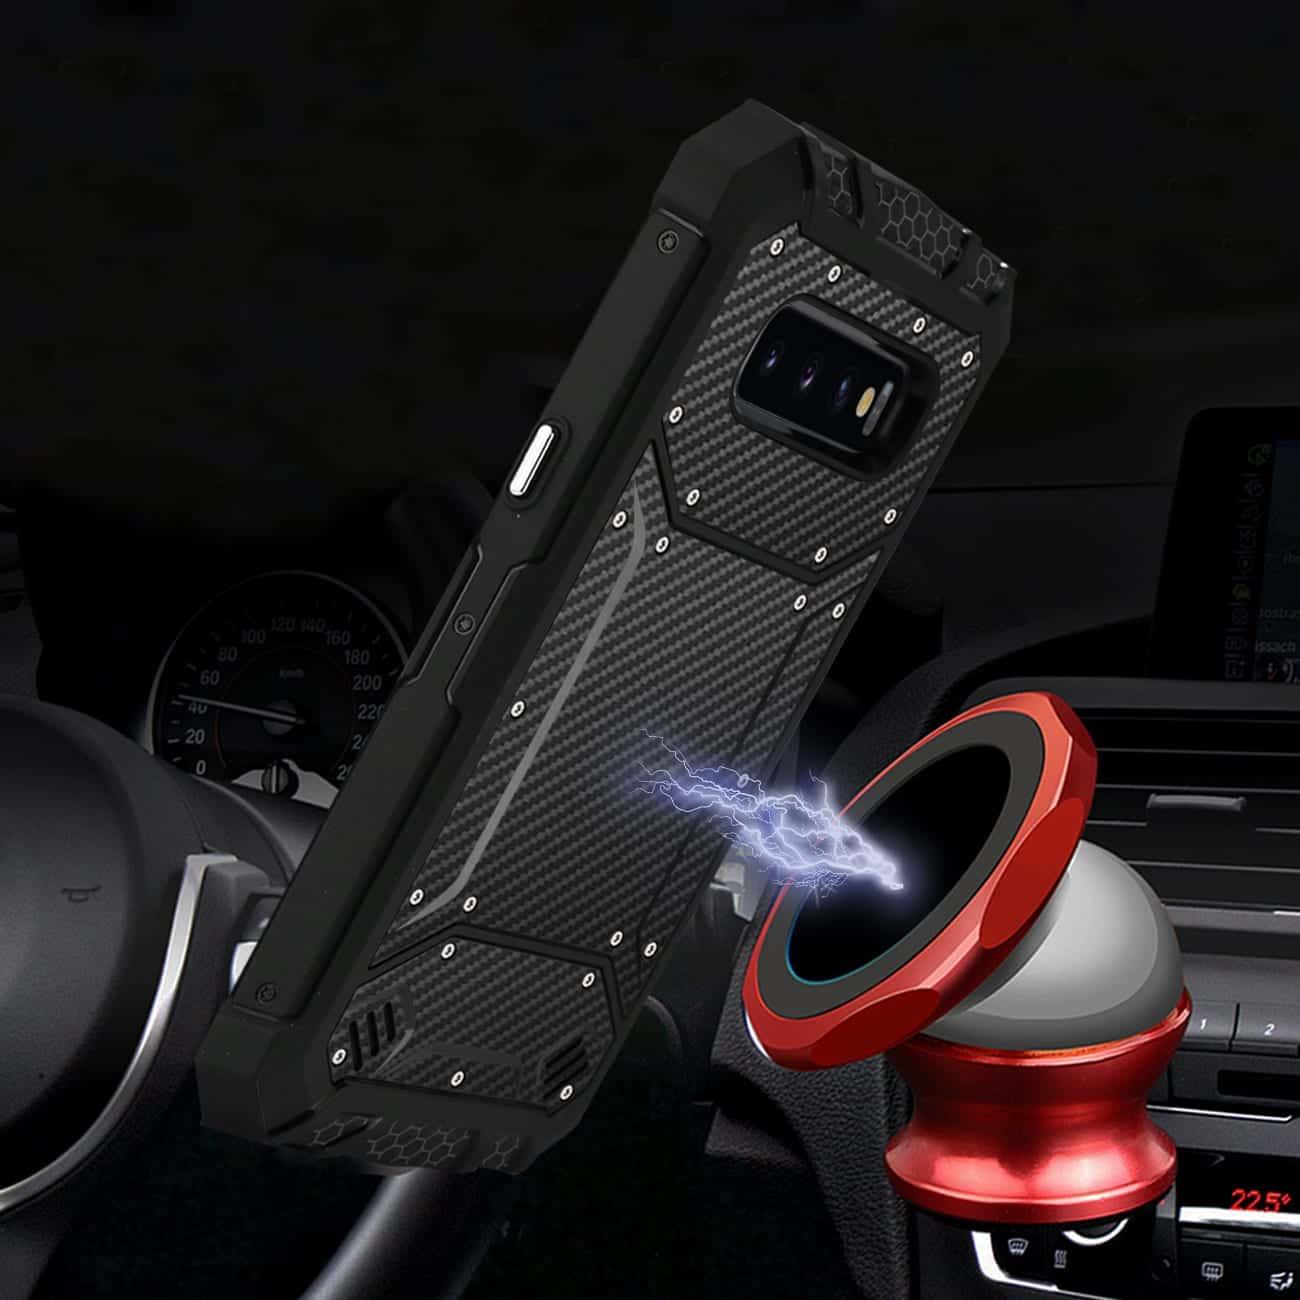 SAMSUNG GALAXY S10 Lite Carbon Fiber Hard-shell Case In Black